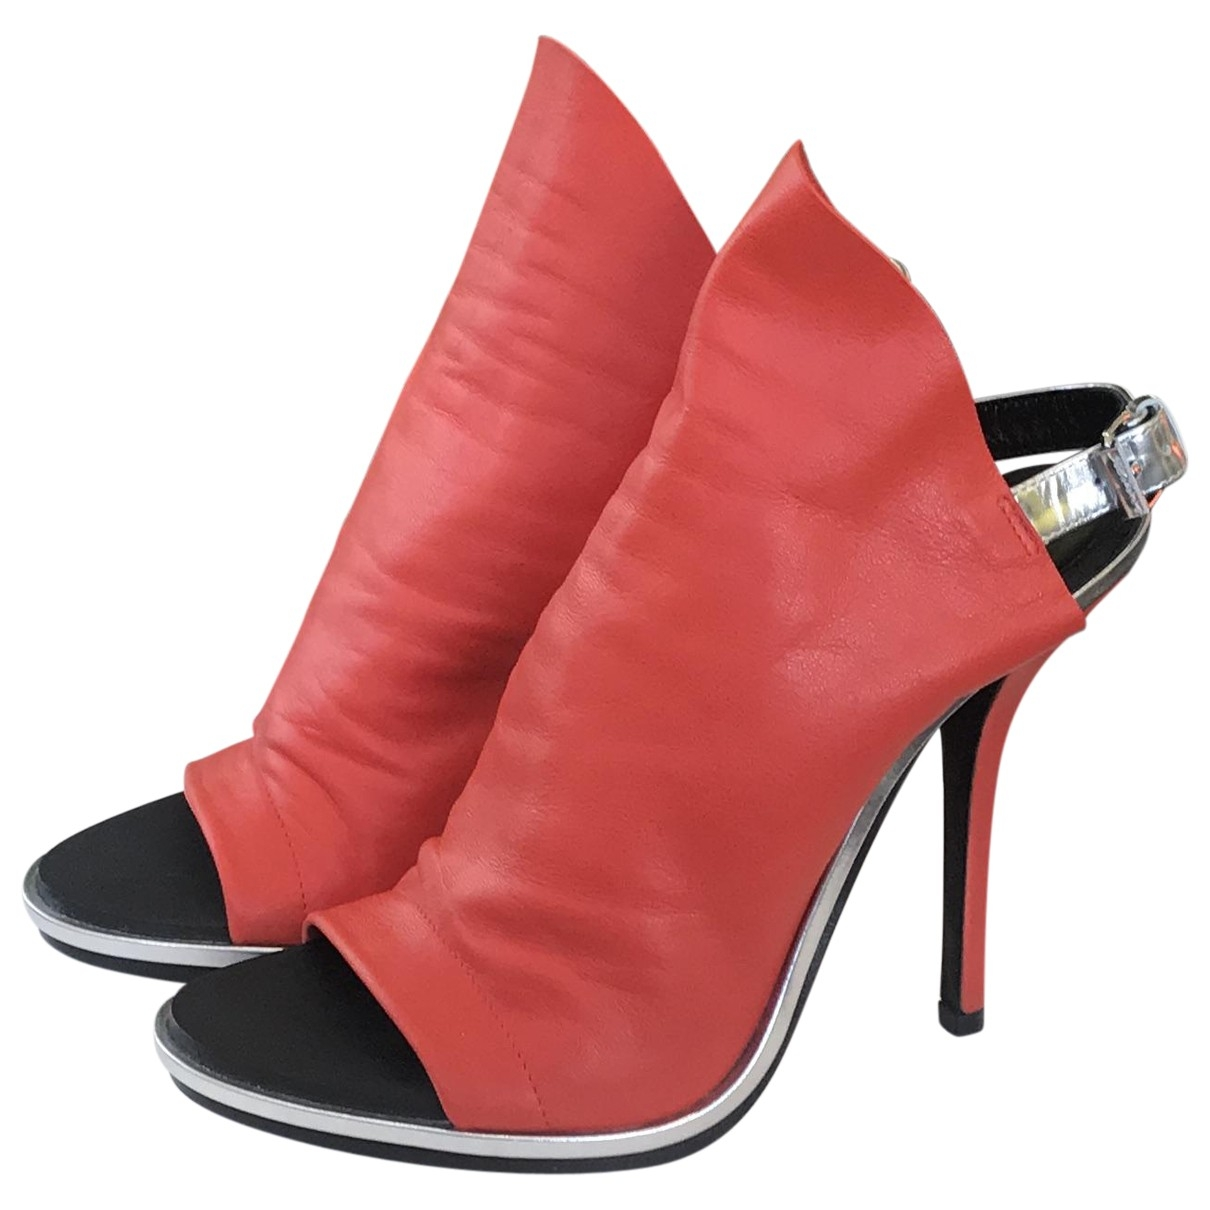 Balenciaga \N Pumps in  Rot Leder